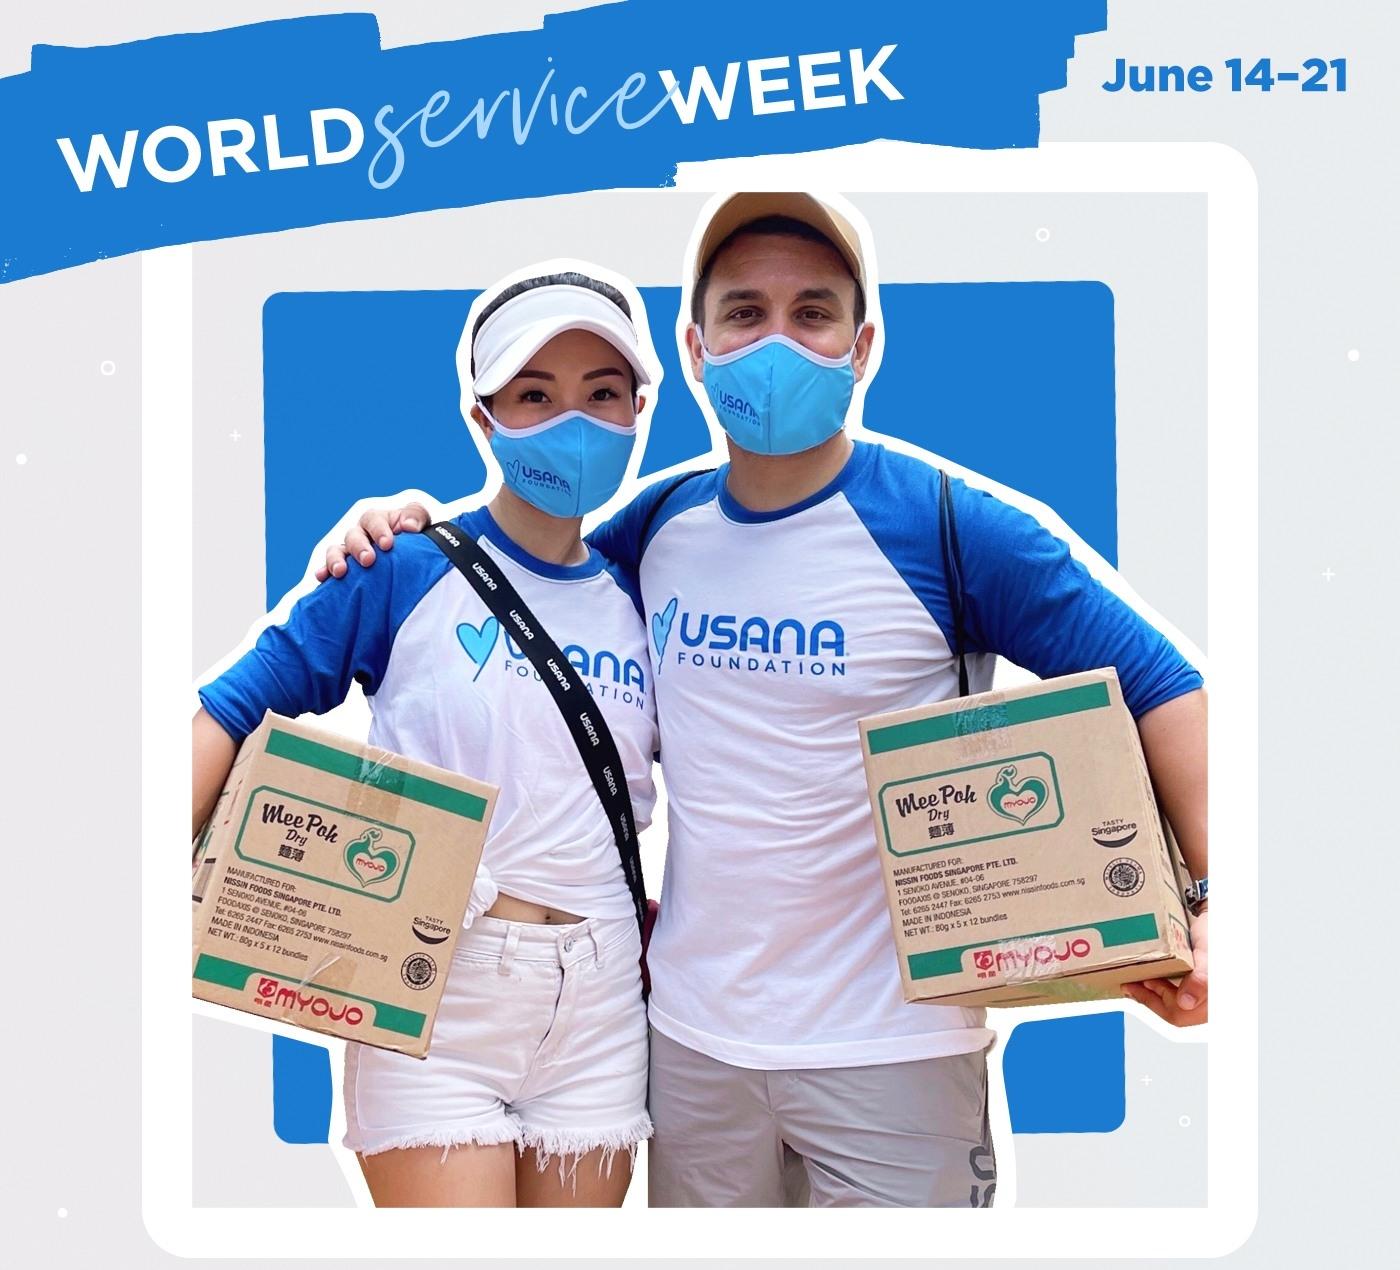 Fabian Ghys World Service Week USANA Associate